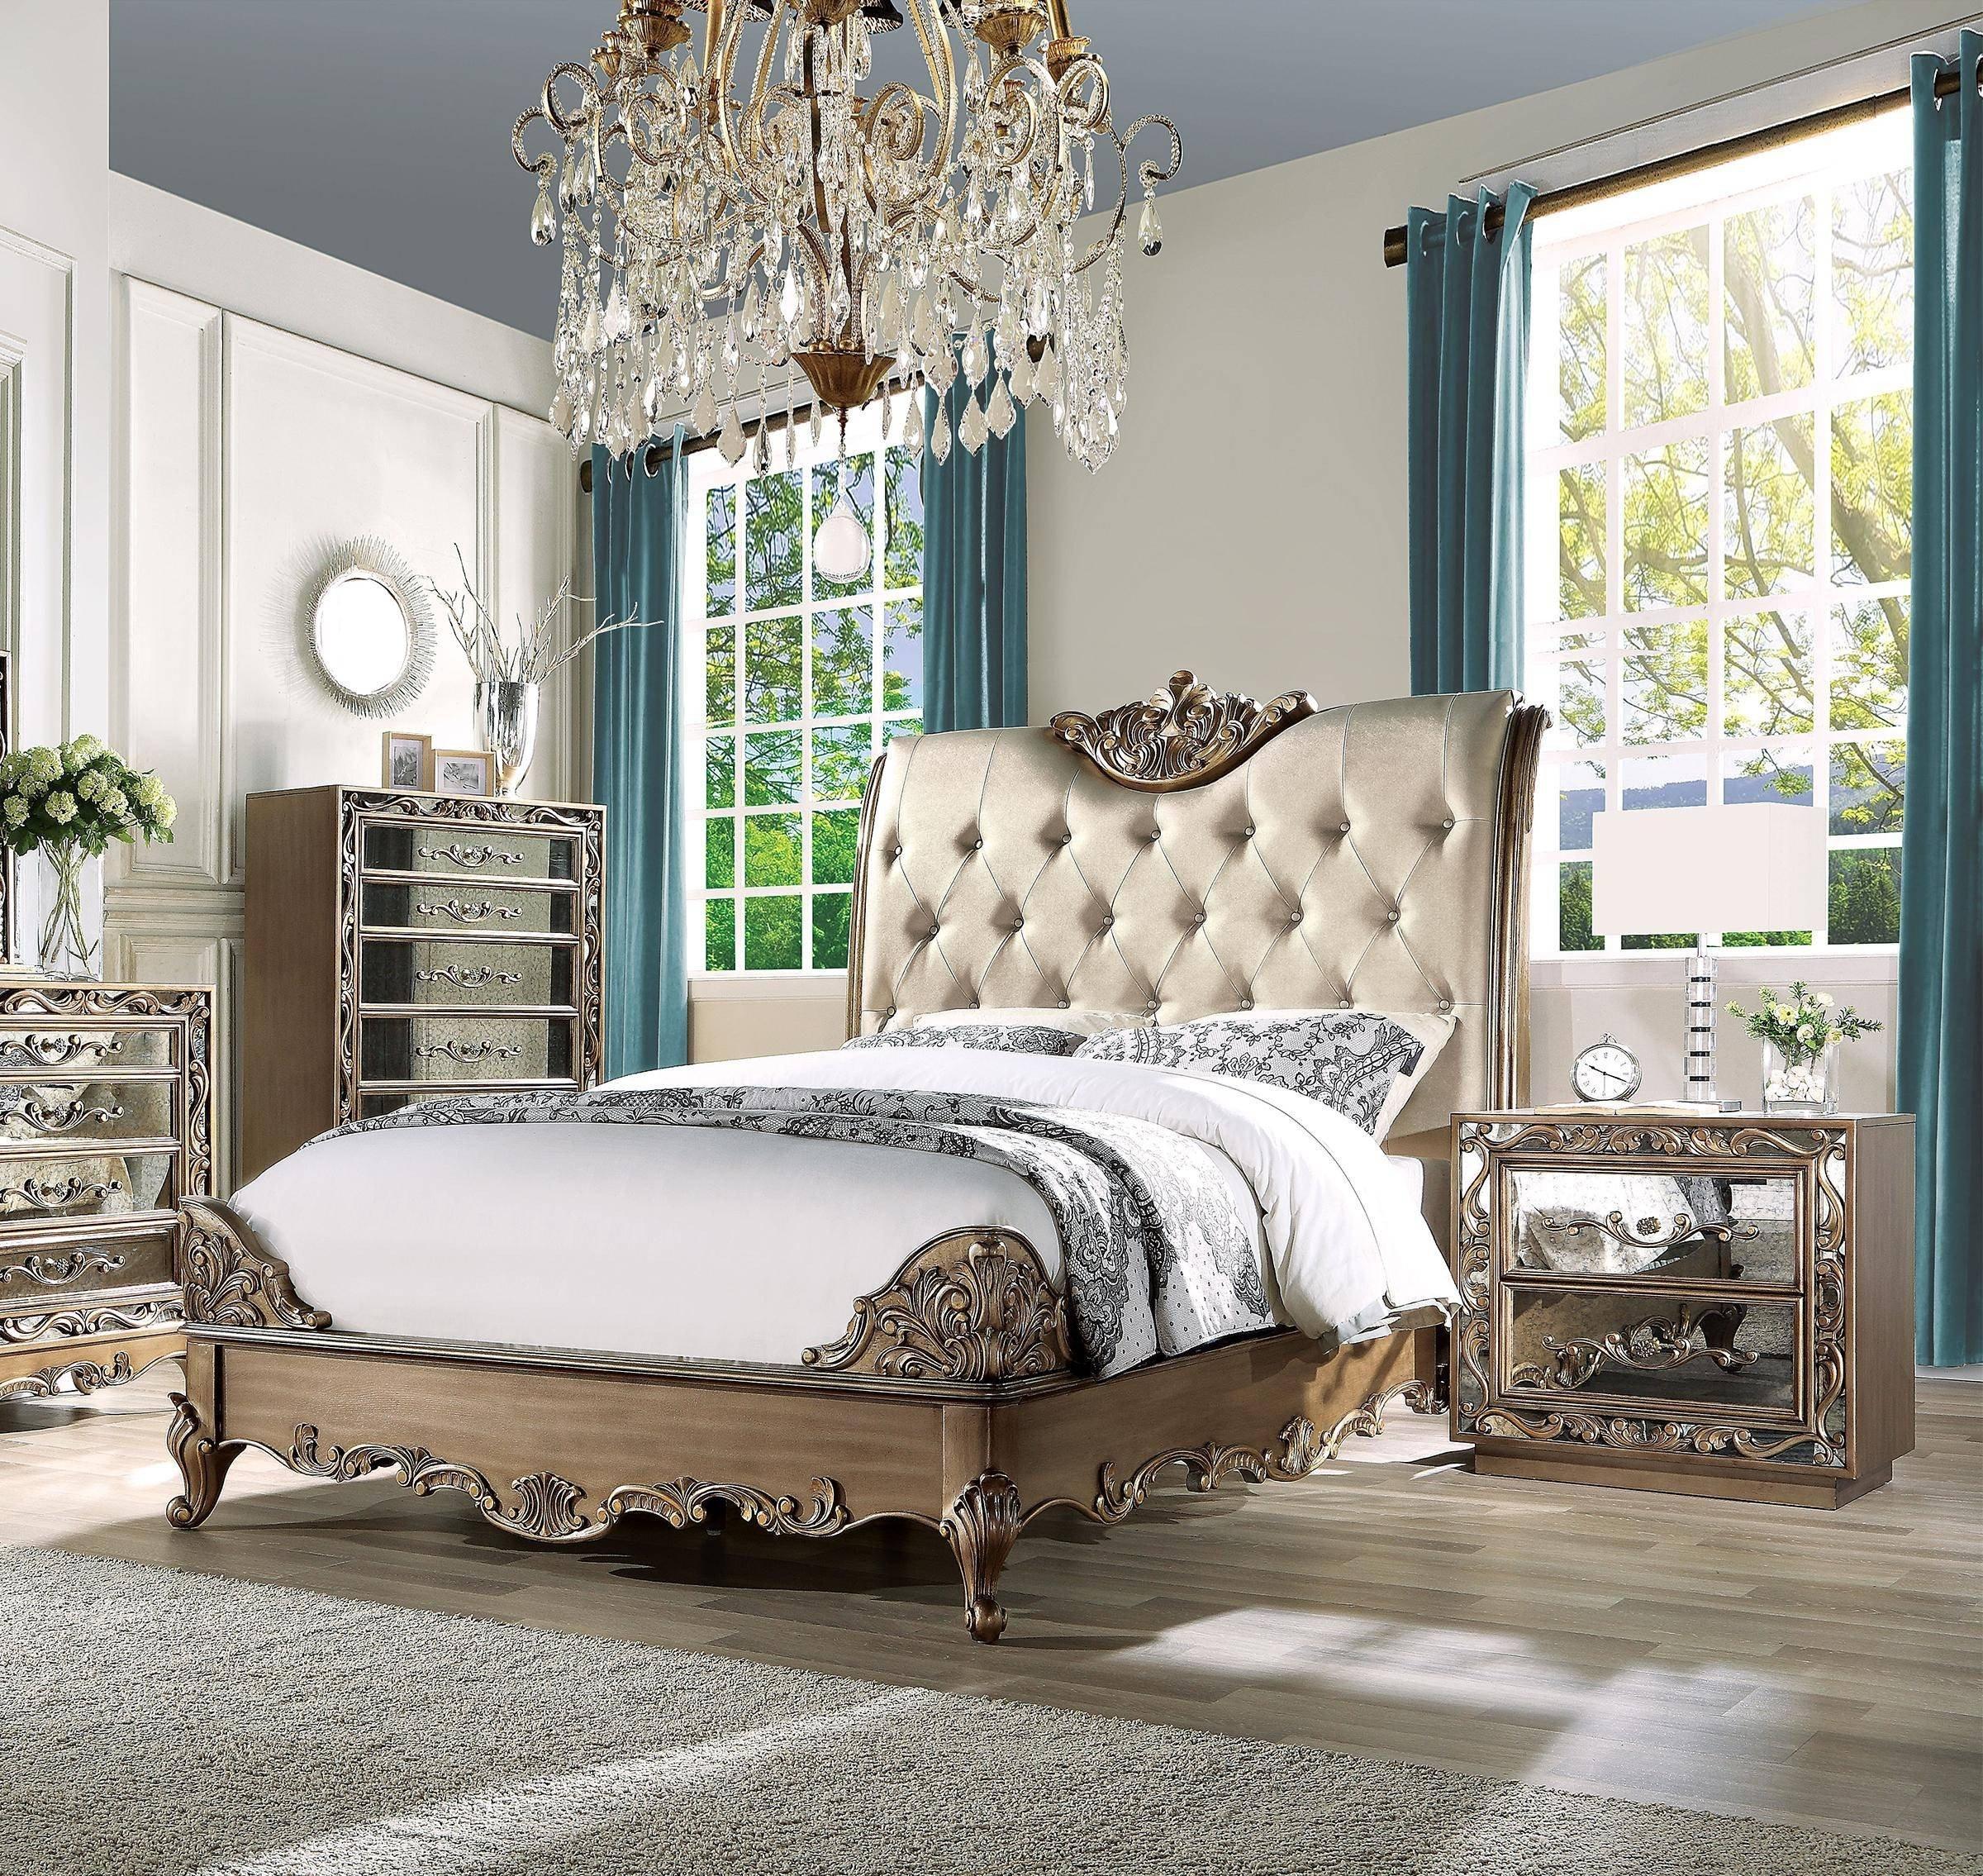 Home Furniture Bedroom Set Best Of Luxury King Bedroom Set 3 Antique Gold Champagne F Leather